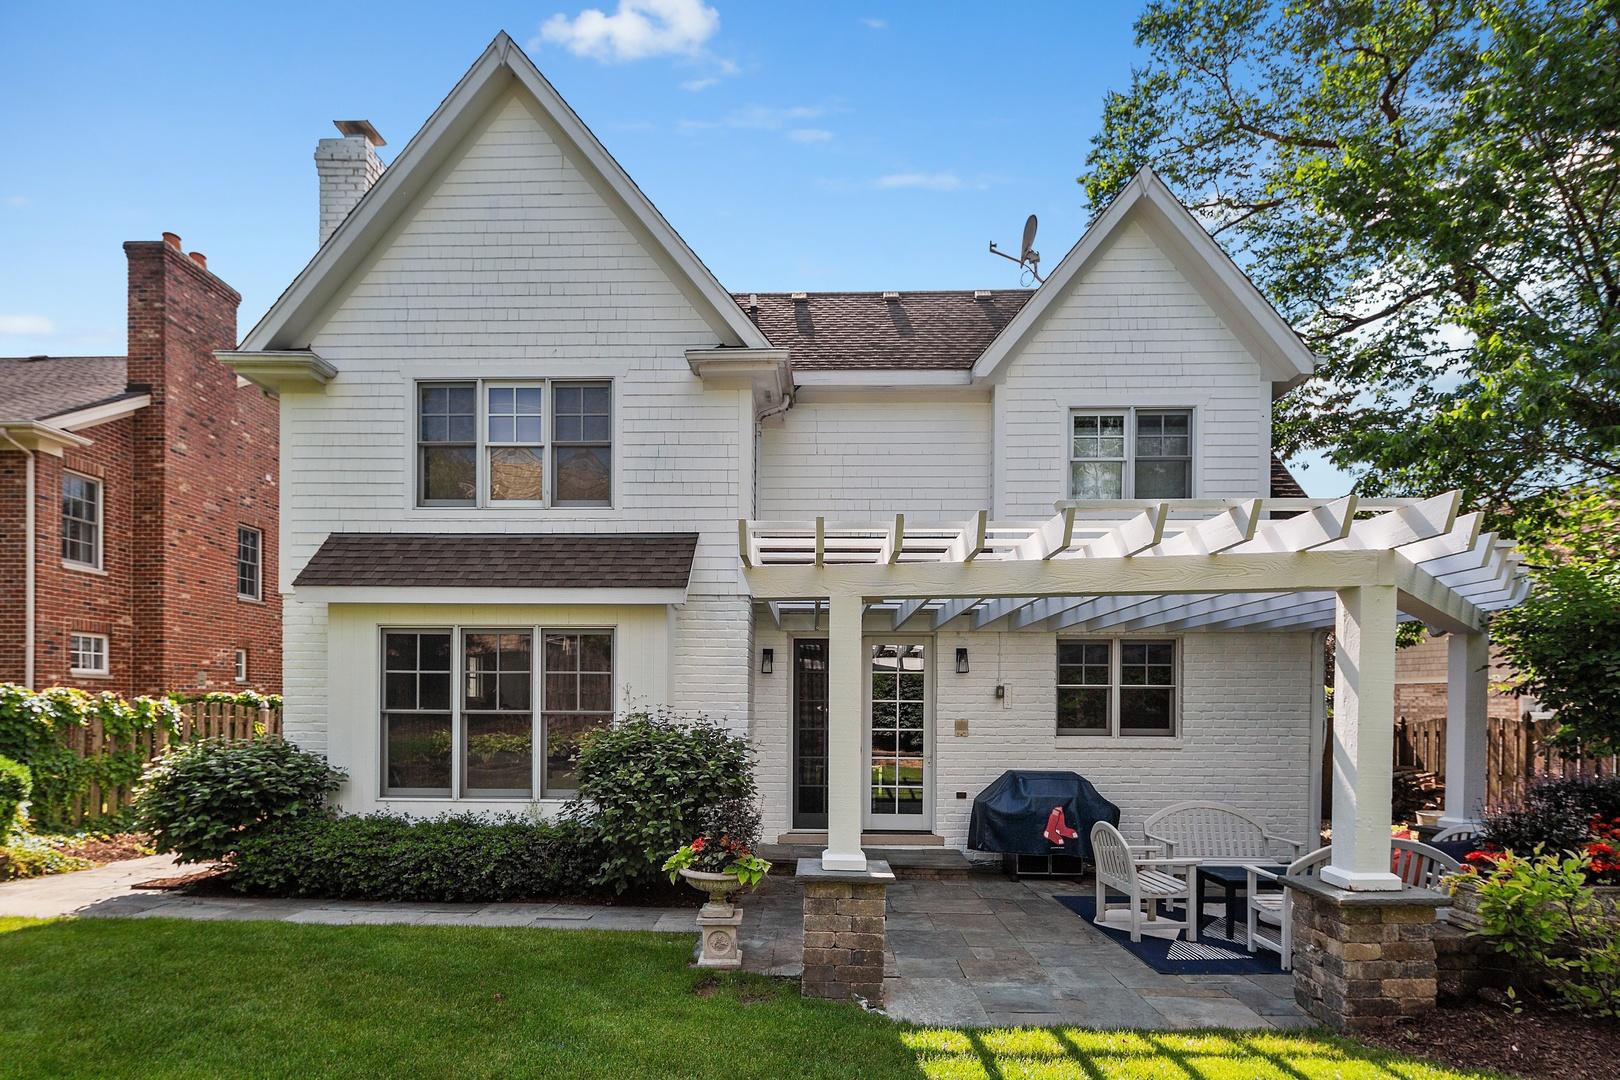 425 South Bodin, Hinsdale, Illinois, 60521